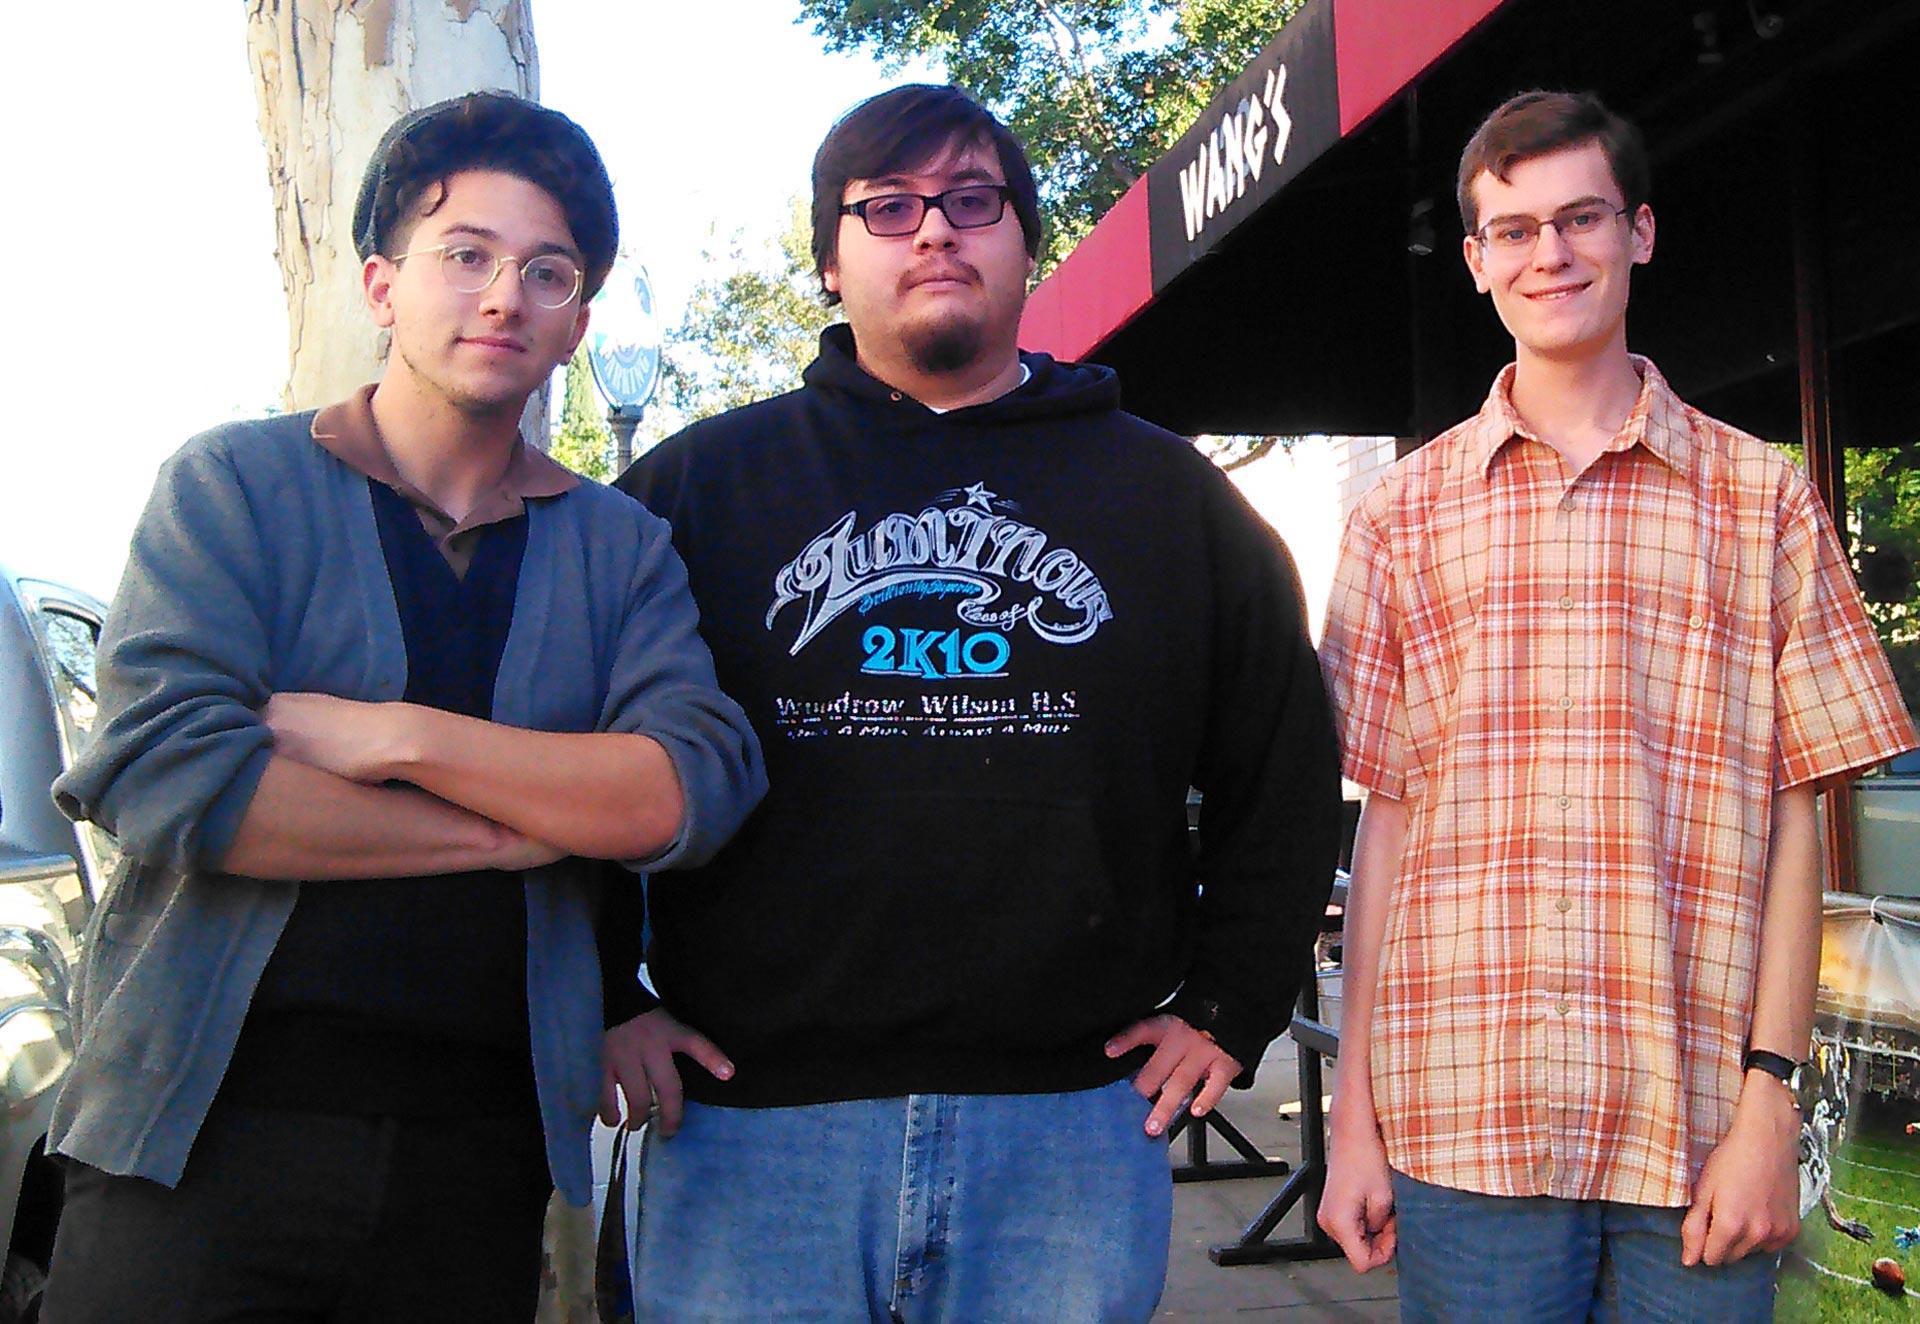 Rose Leaf Ragtime Club members Vincent Johnson, Edward Maraga and Ryan Wishner (L-R).